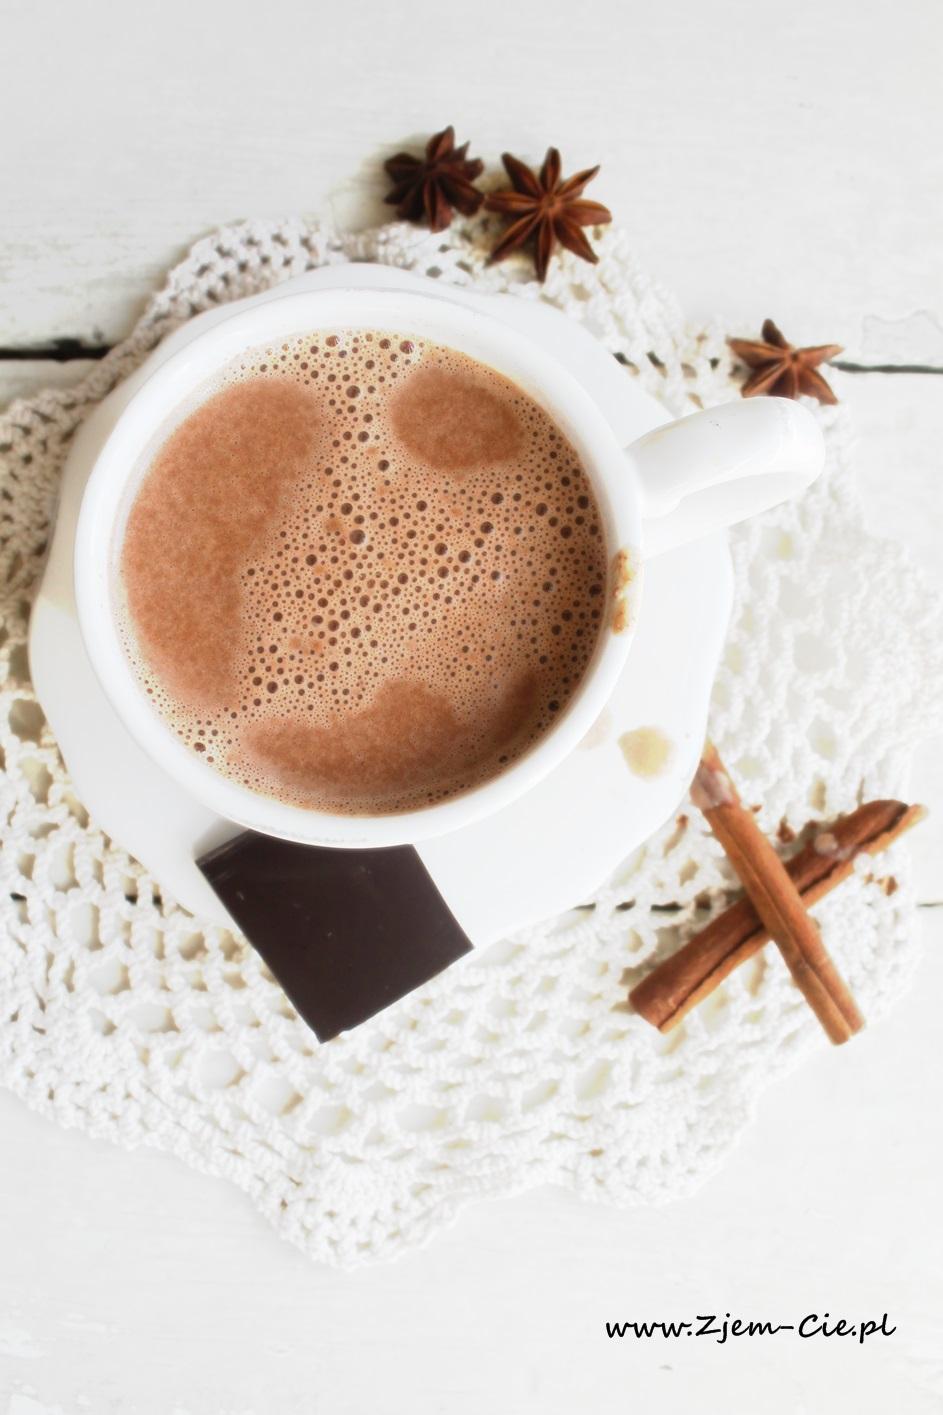 Gorącza czekolada do picia